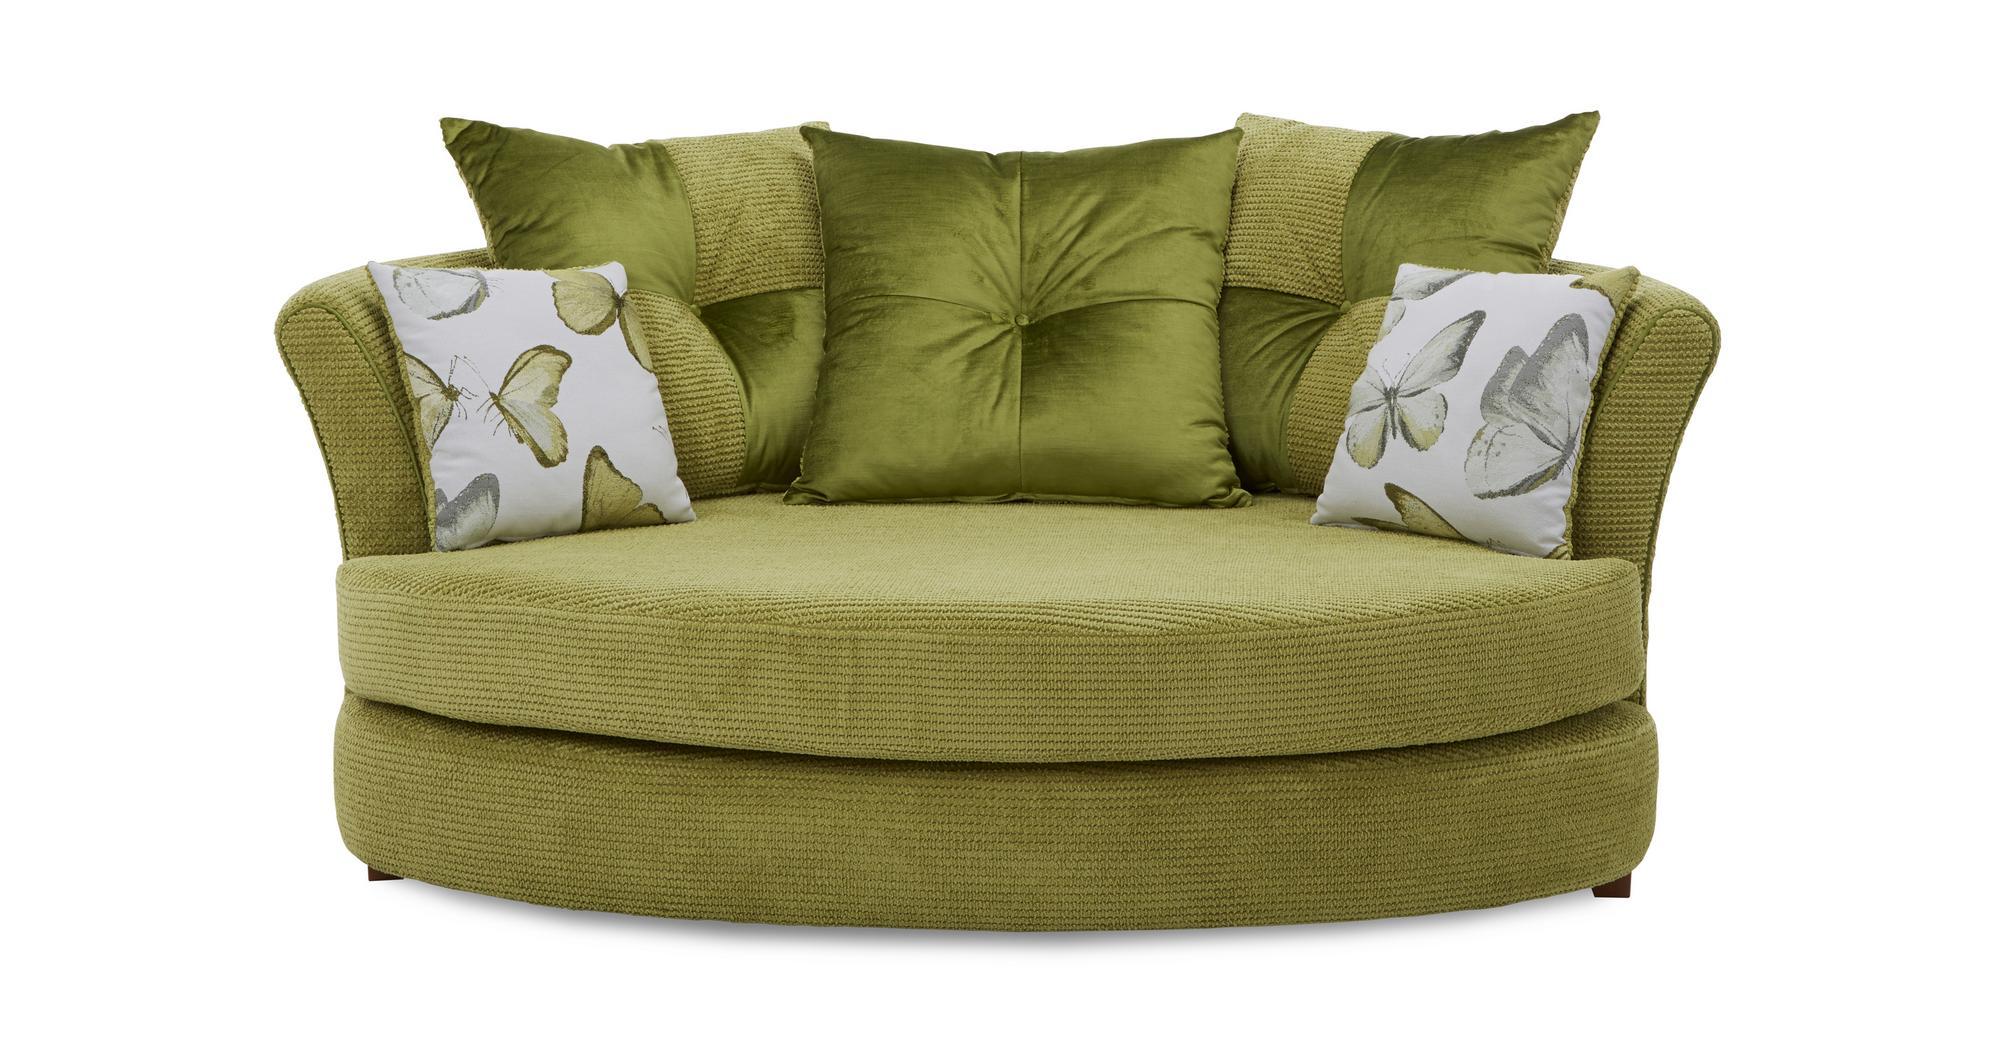 Dfs Capulet Lime Fabric Cuddler Sofa Amp Patterned Accent